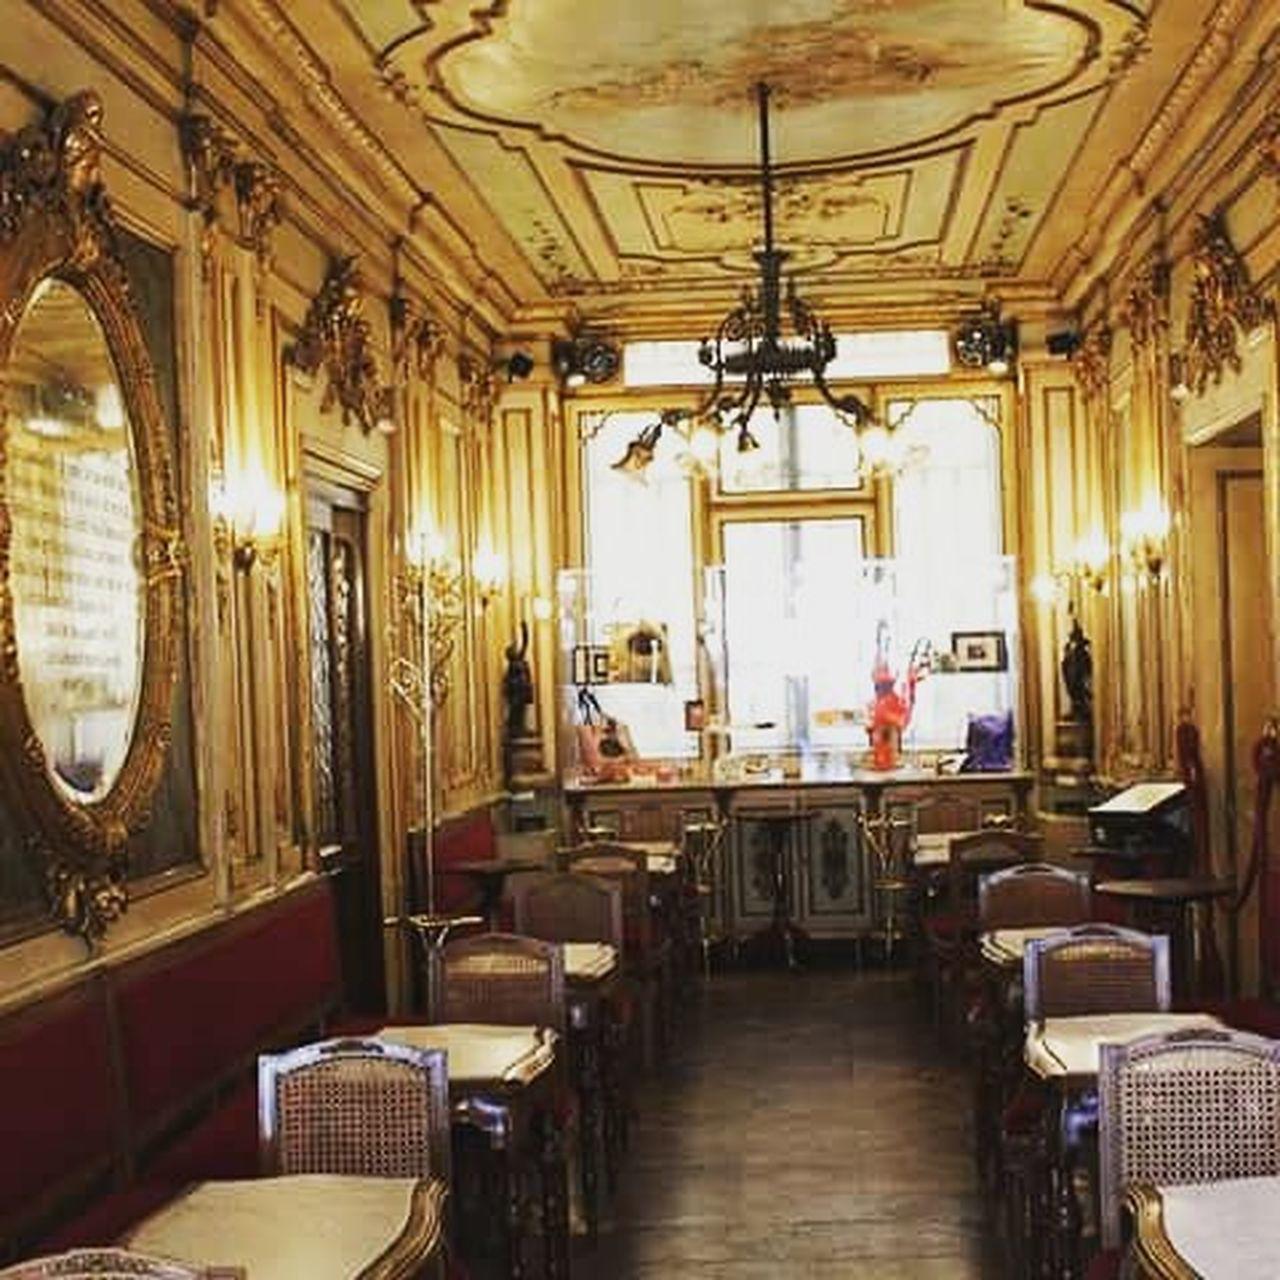 Floriantearoom Venice Veniceitaly2015